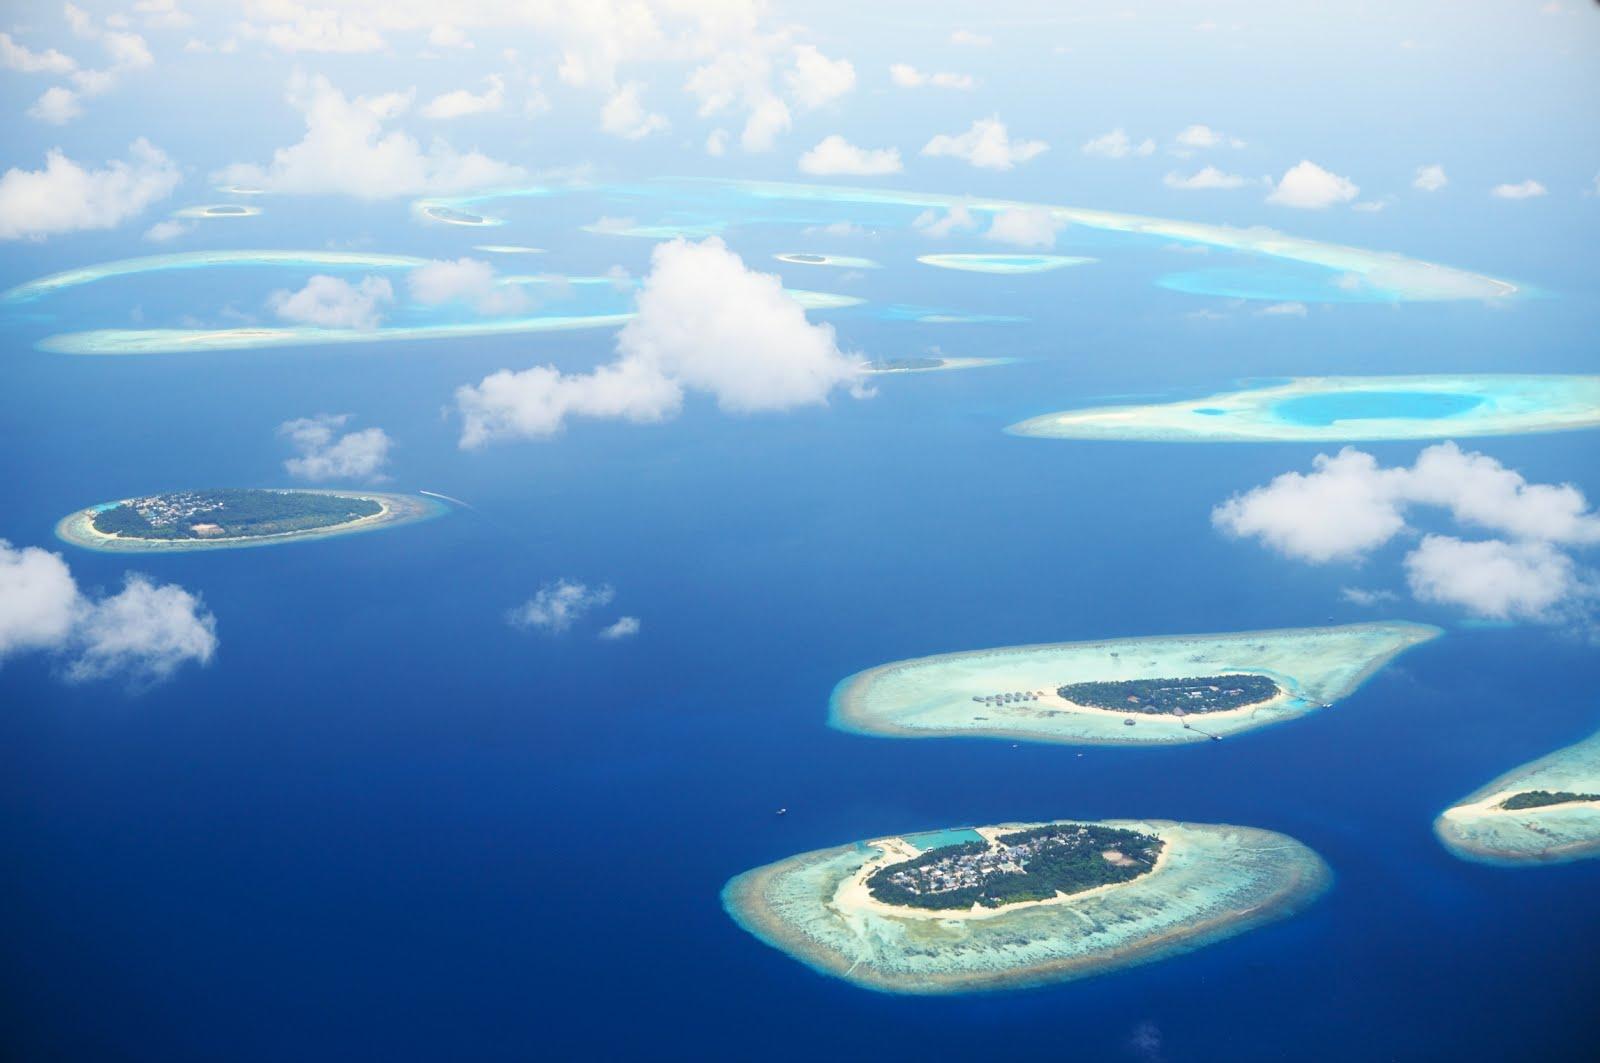 maldives isalnds.jpg